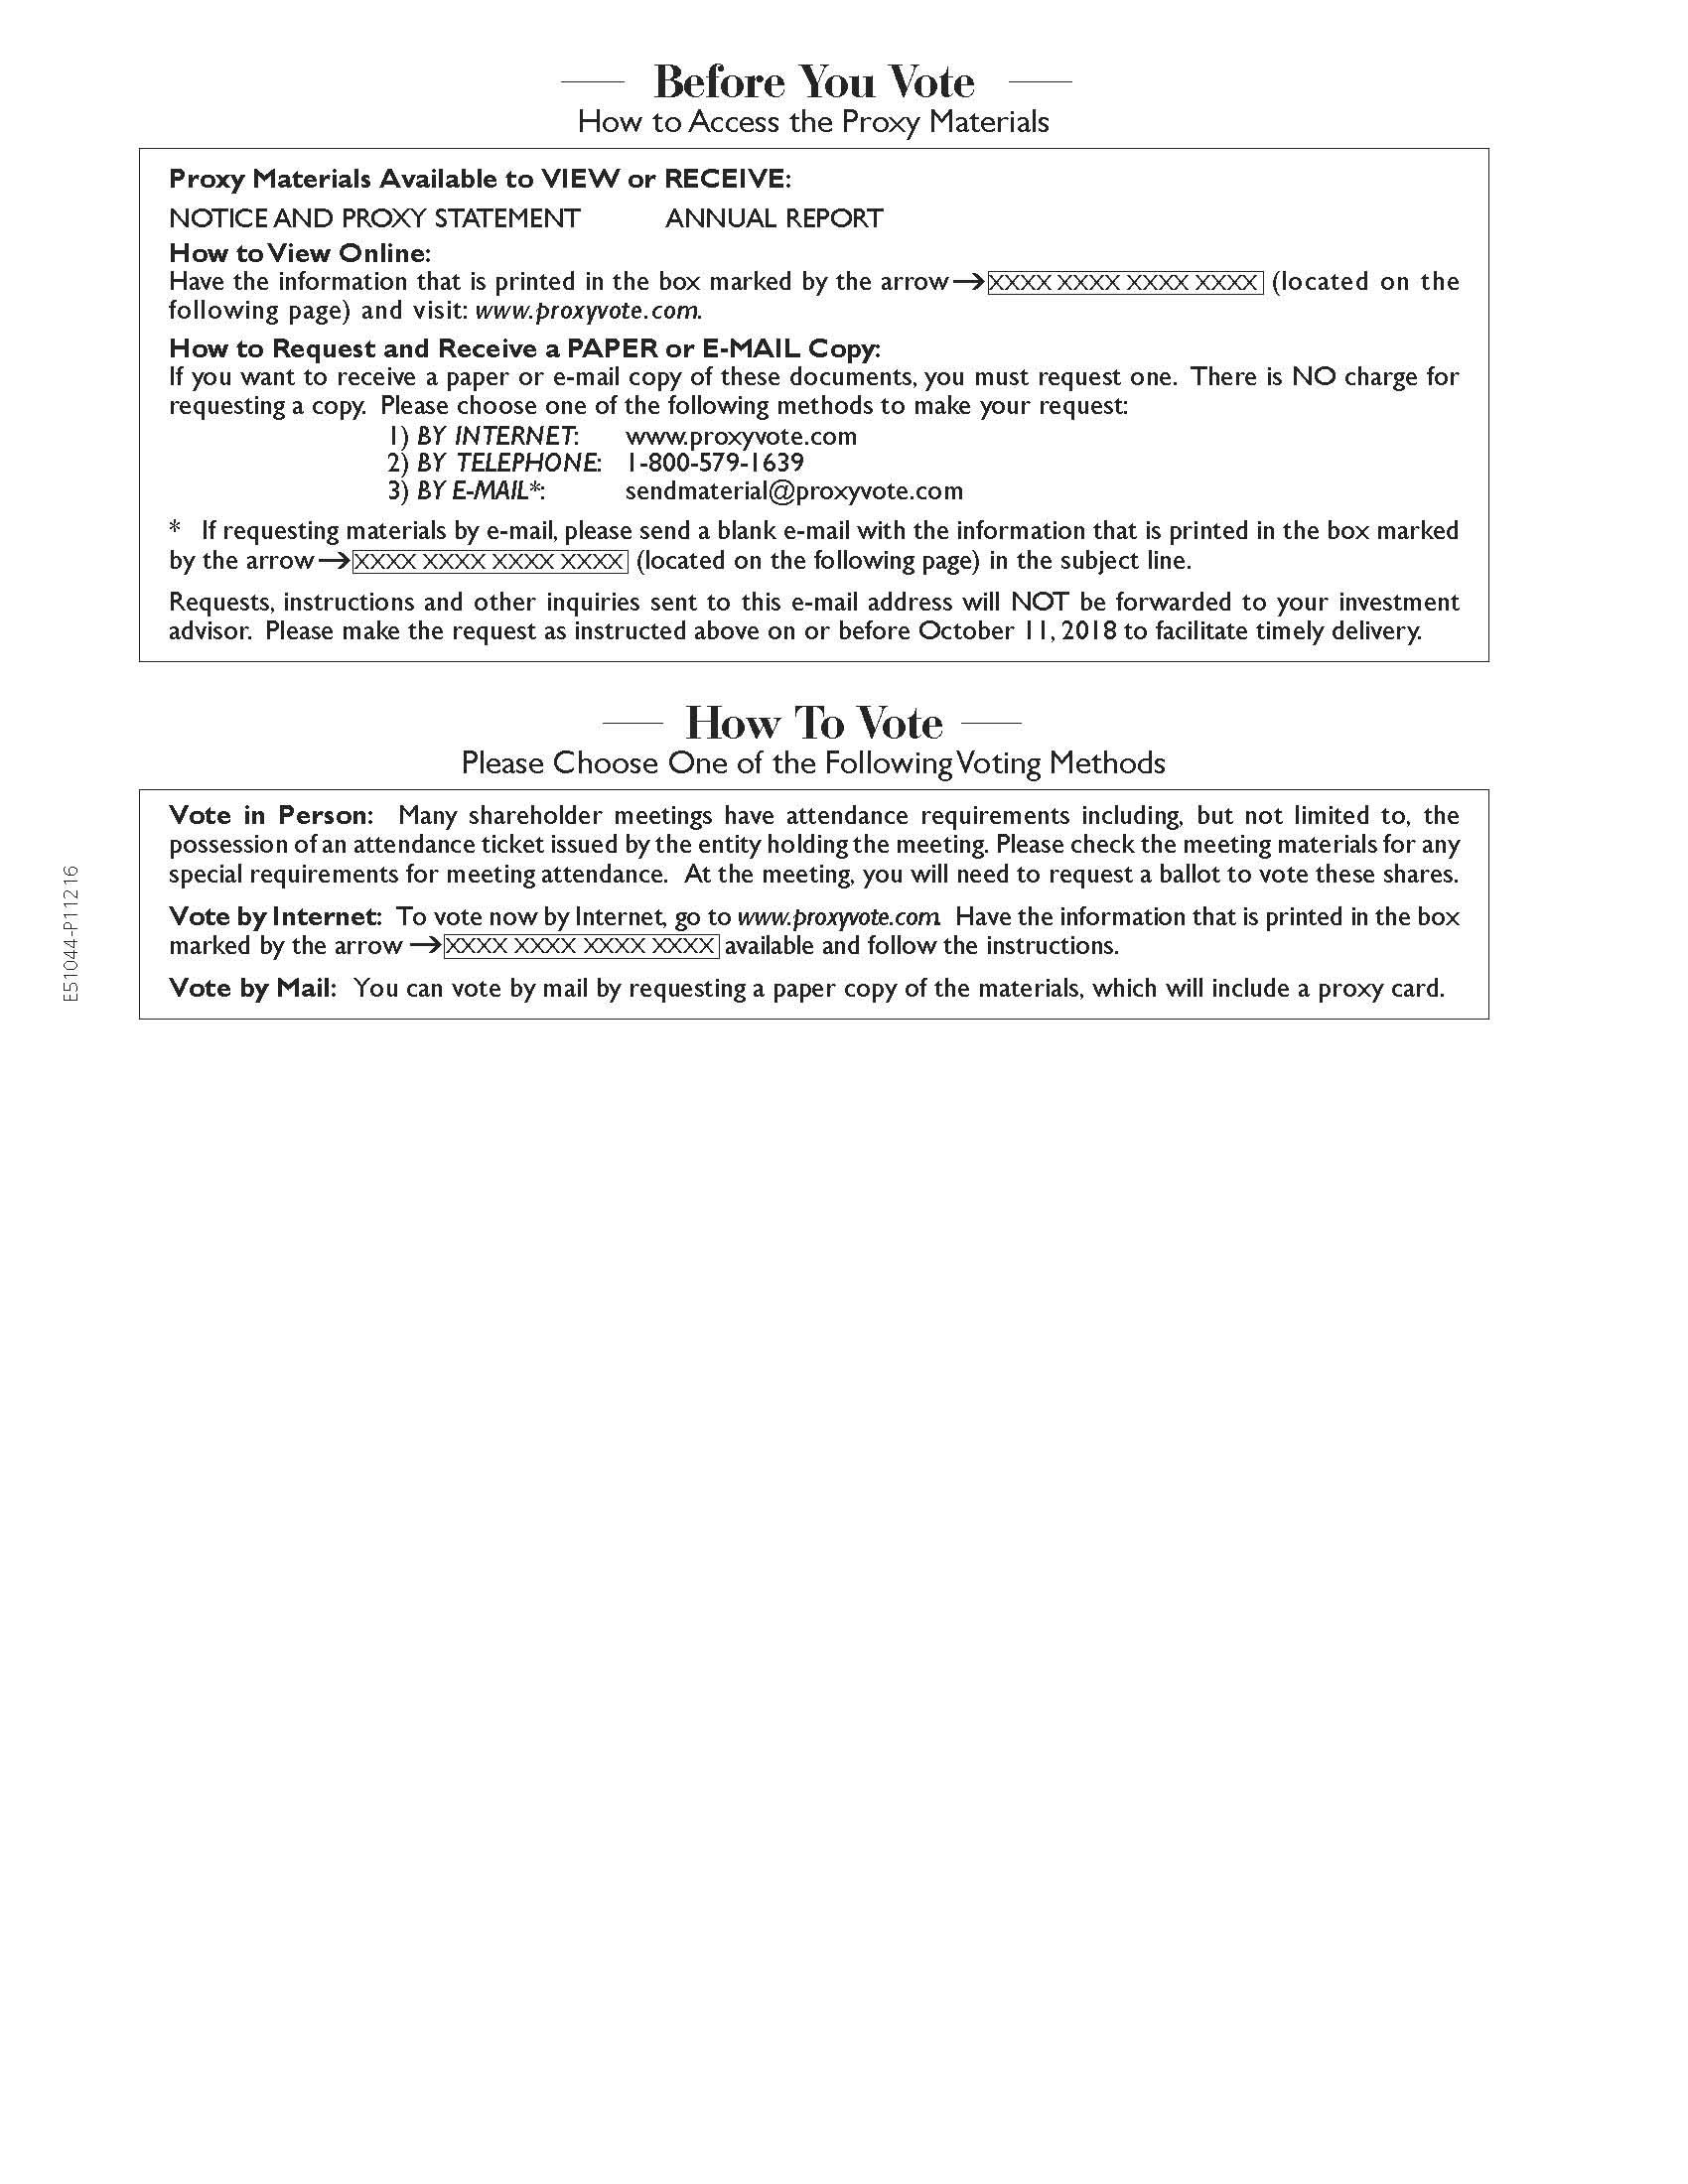 NOTICECARDPAGE2.JPG